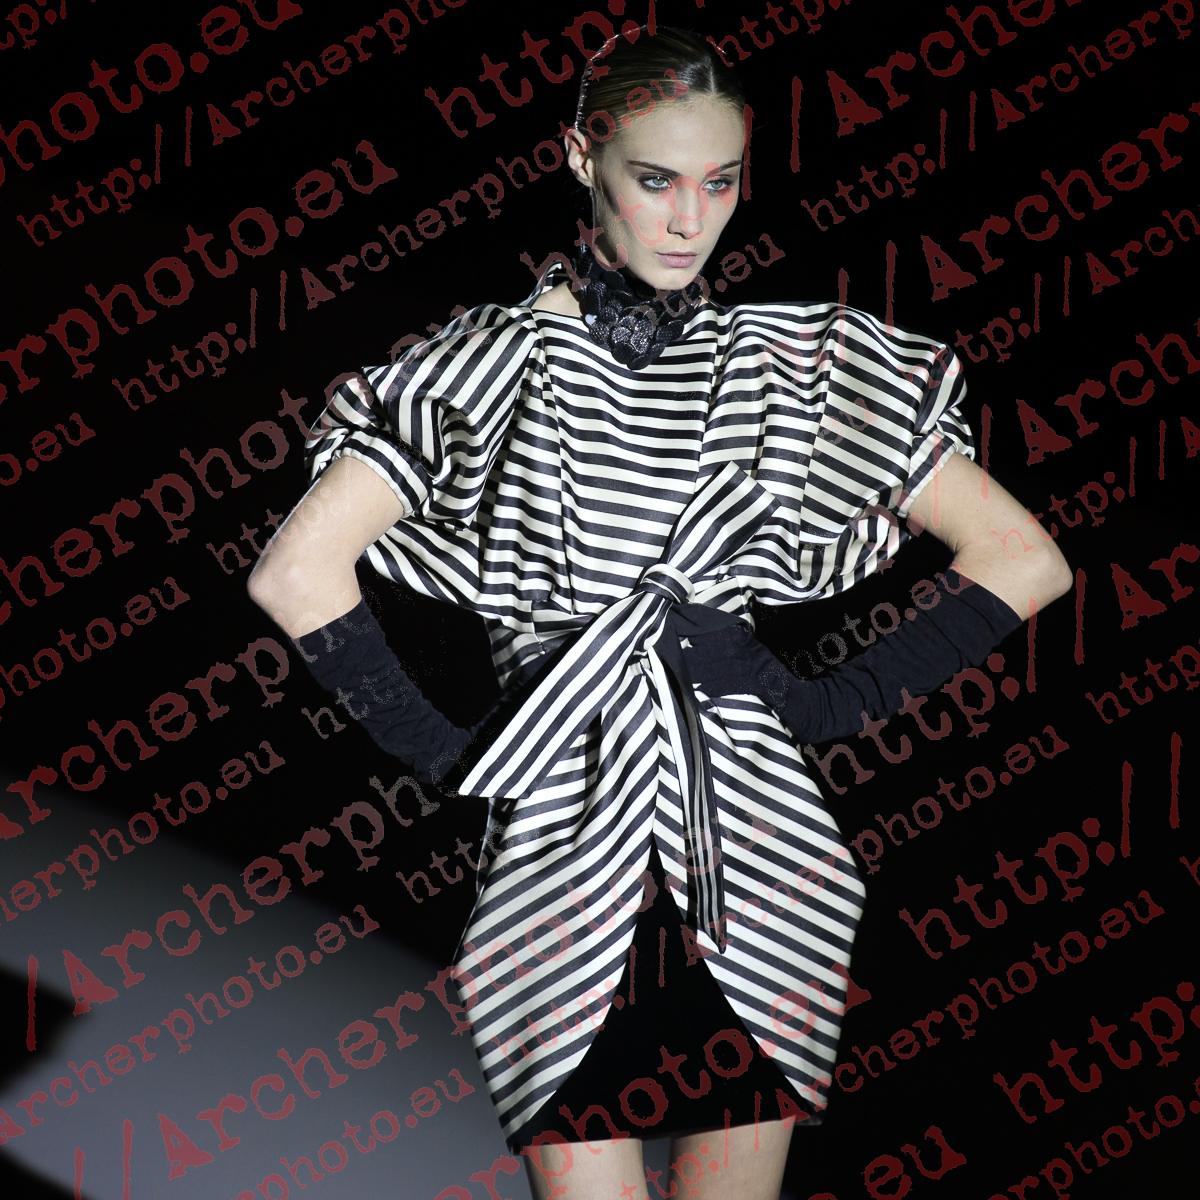 Elena Santamatilde in Mompó, Valencia Fashion Week February 2nd 2011